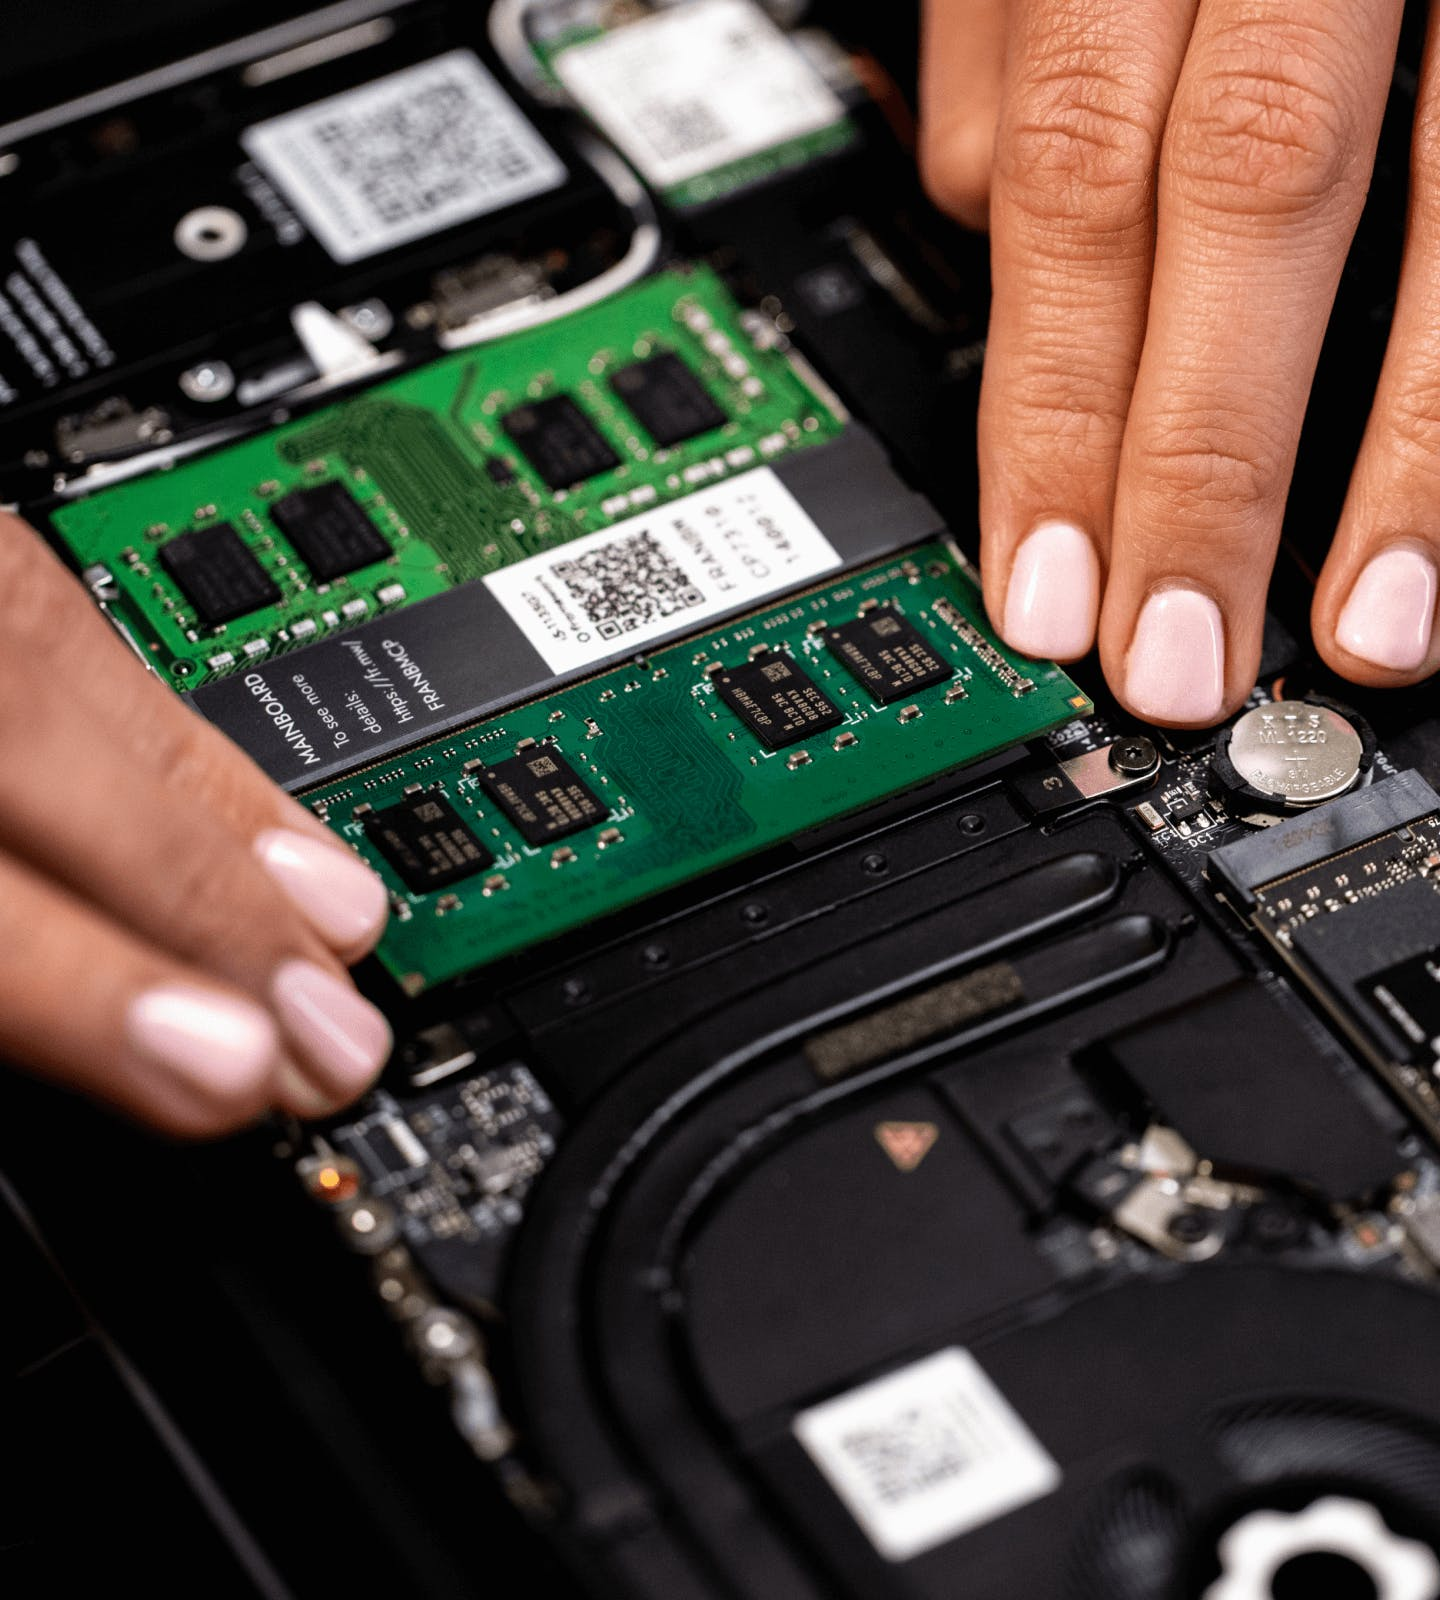 Upgrade Framework Laptop with ease